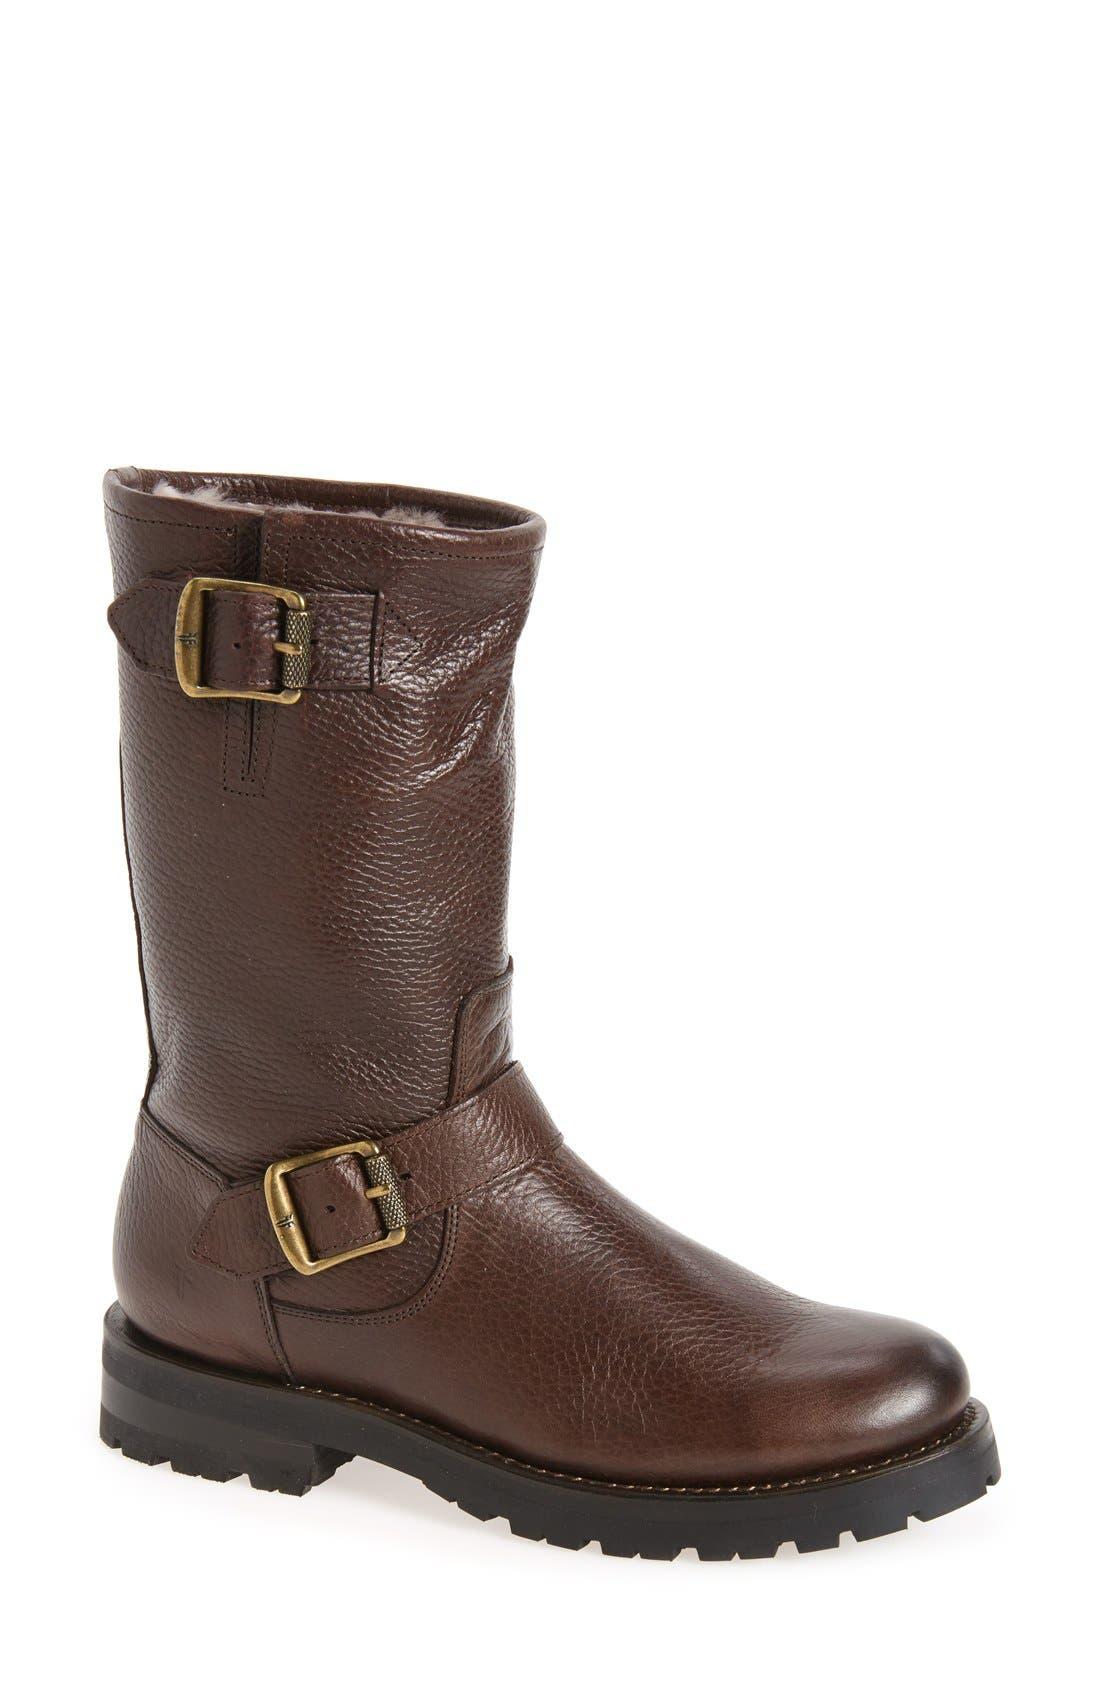 Alternate Image 1 Selected - Frye Natalie Buckle Strap Engineer Genuine Shearling Lined Boot (Women)